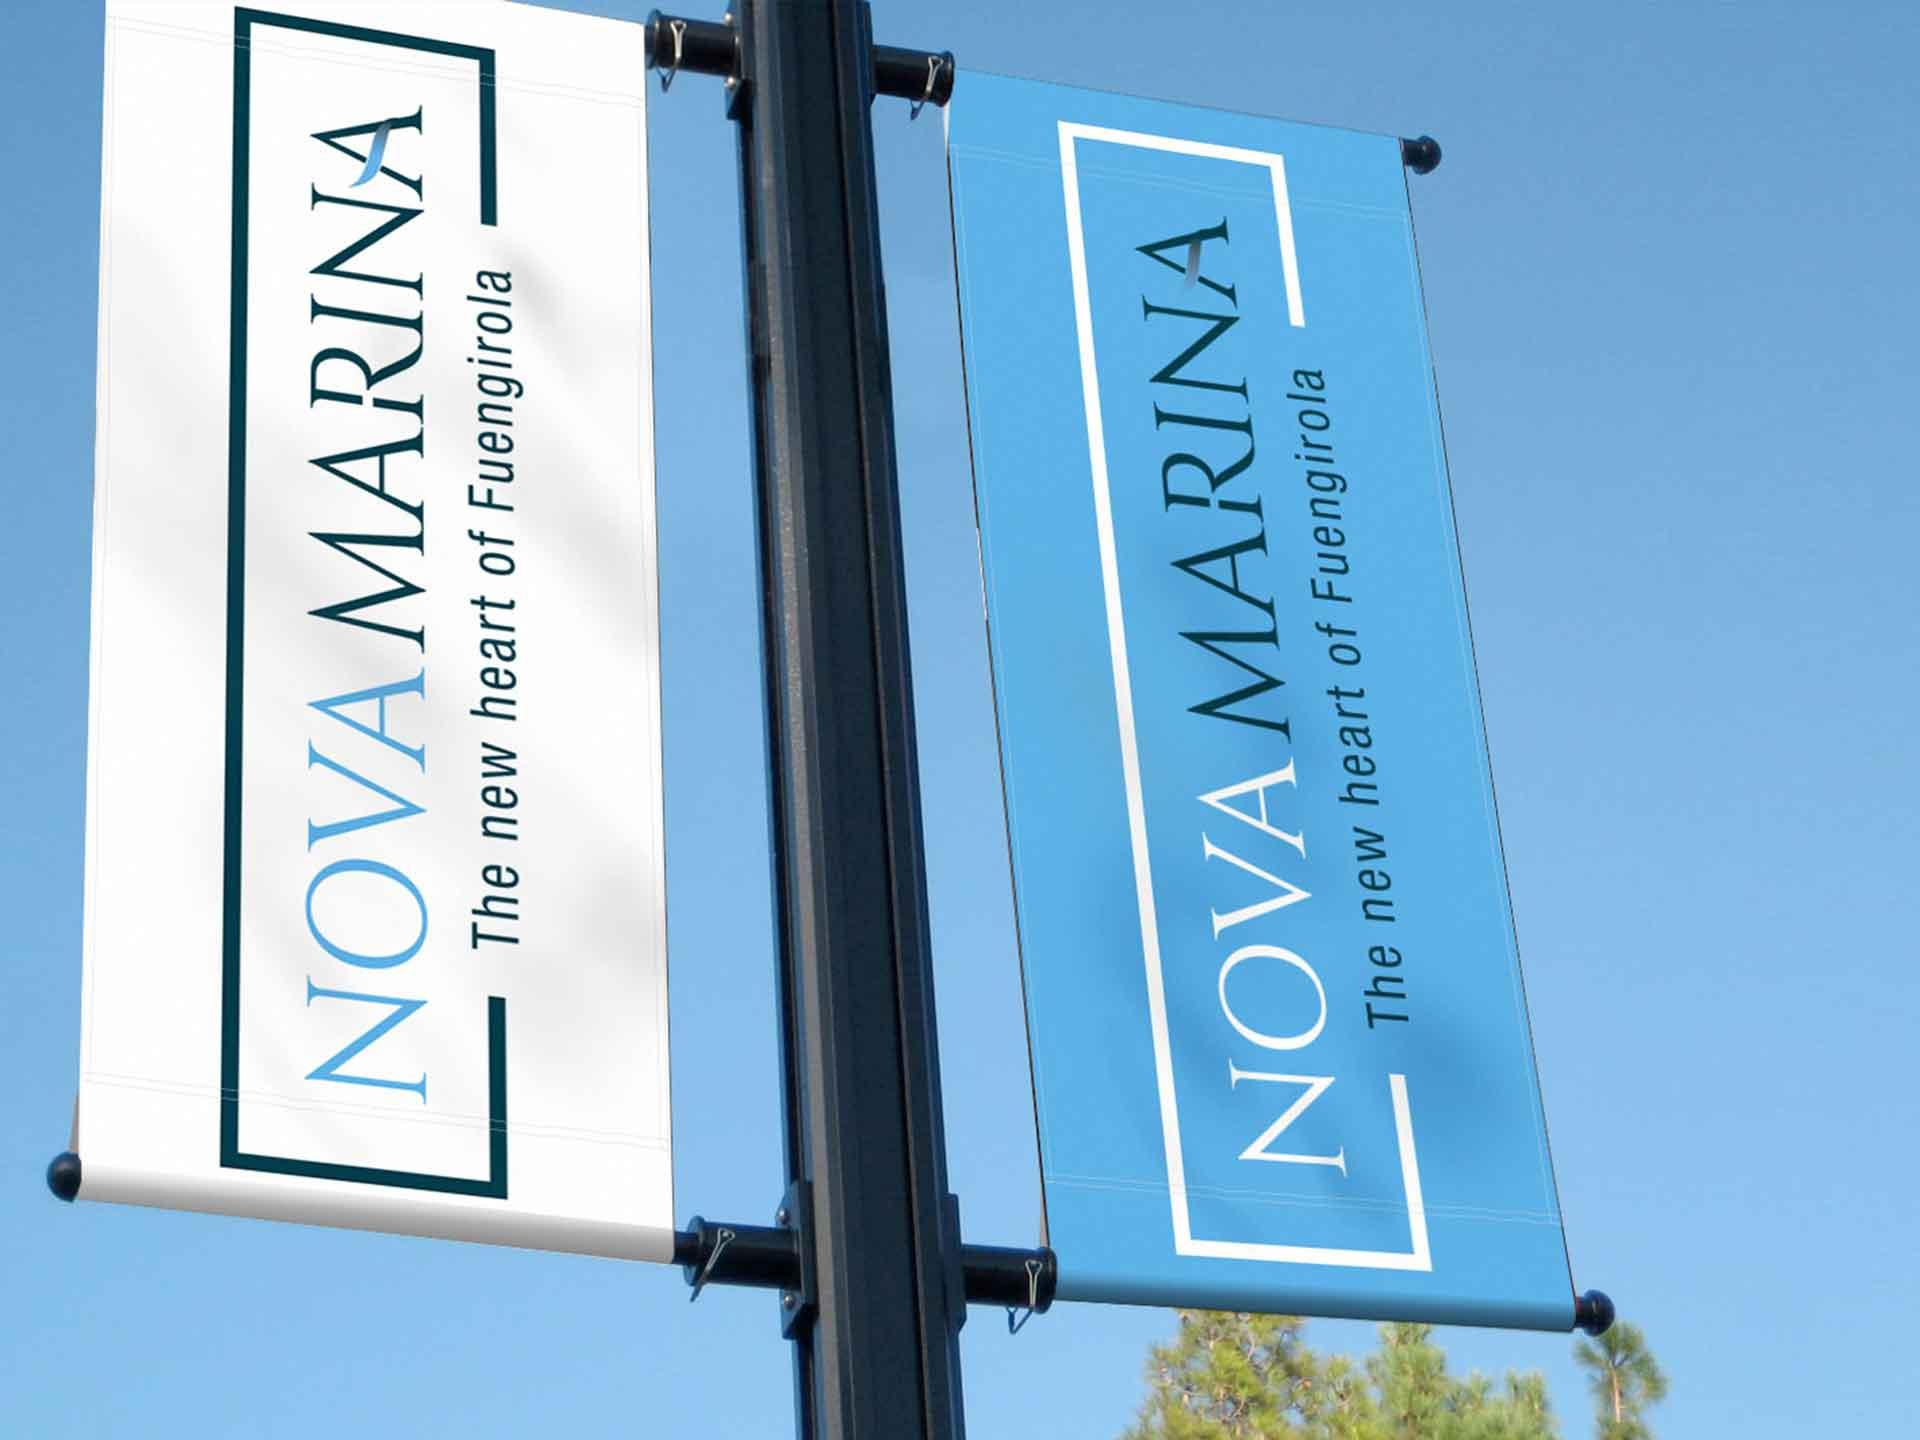 Diseño gráfico Nova Marina - mobiliario urbano